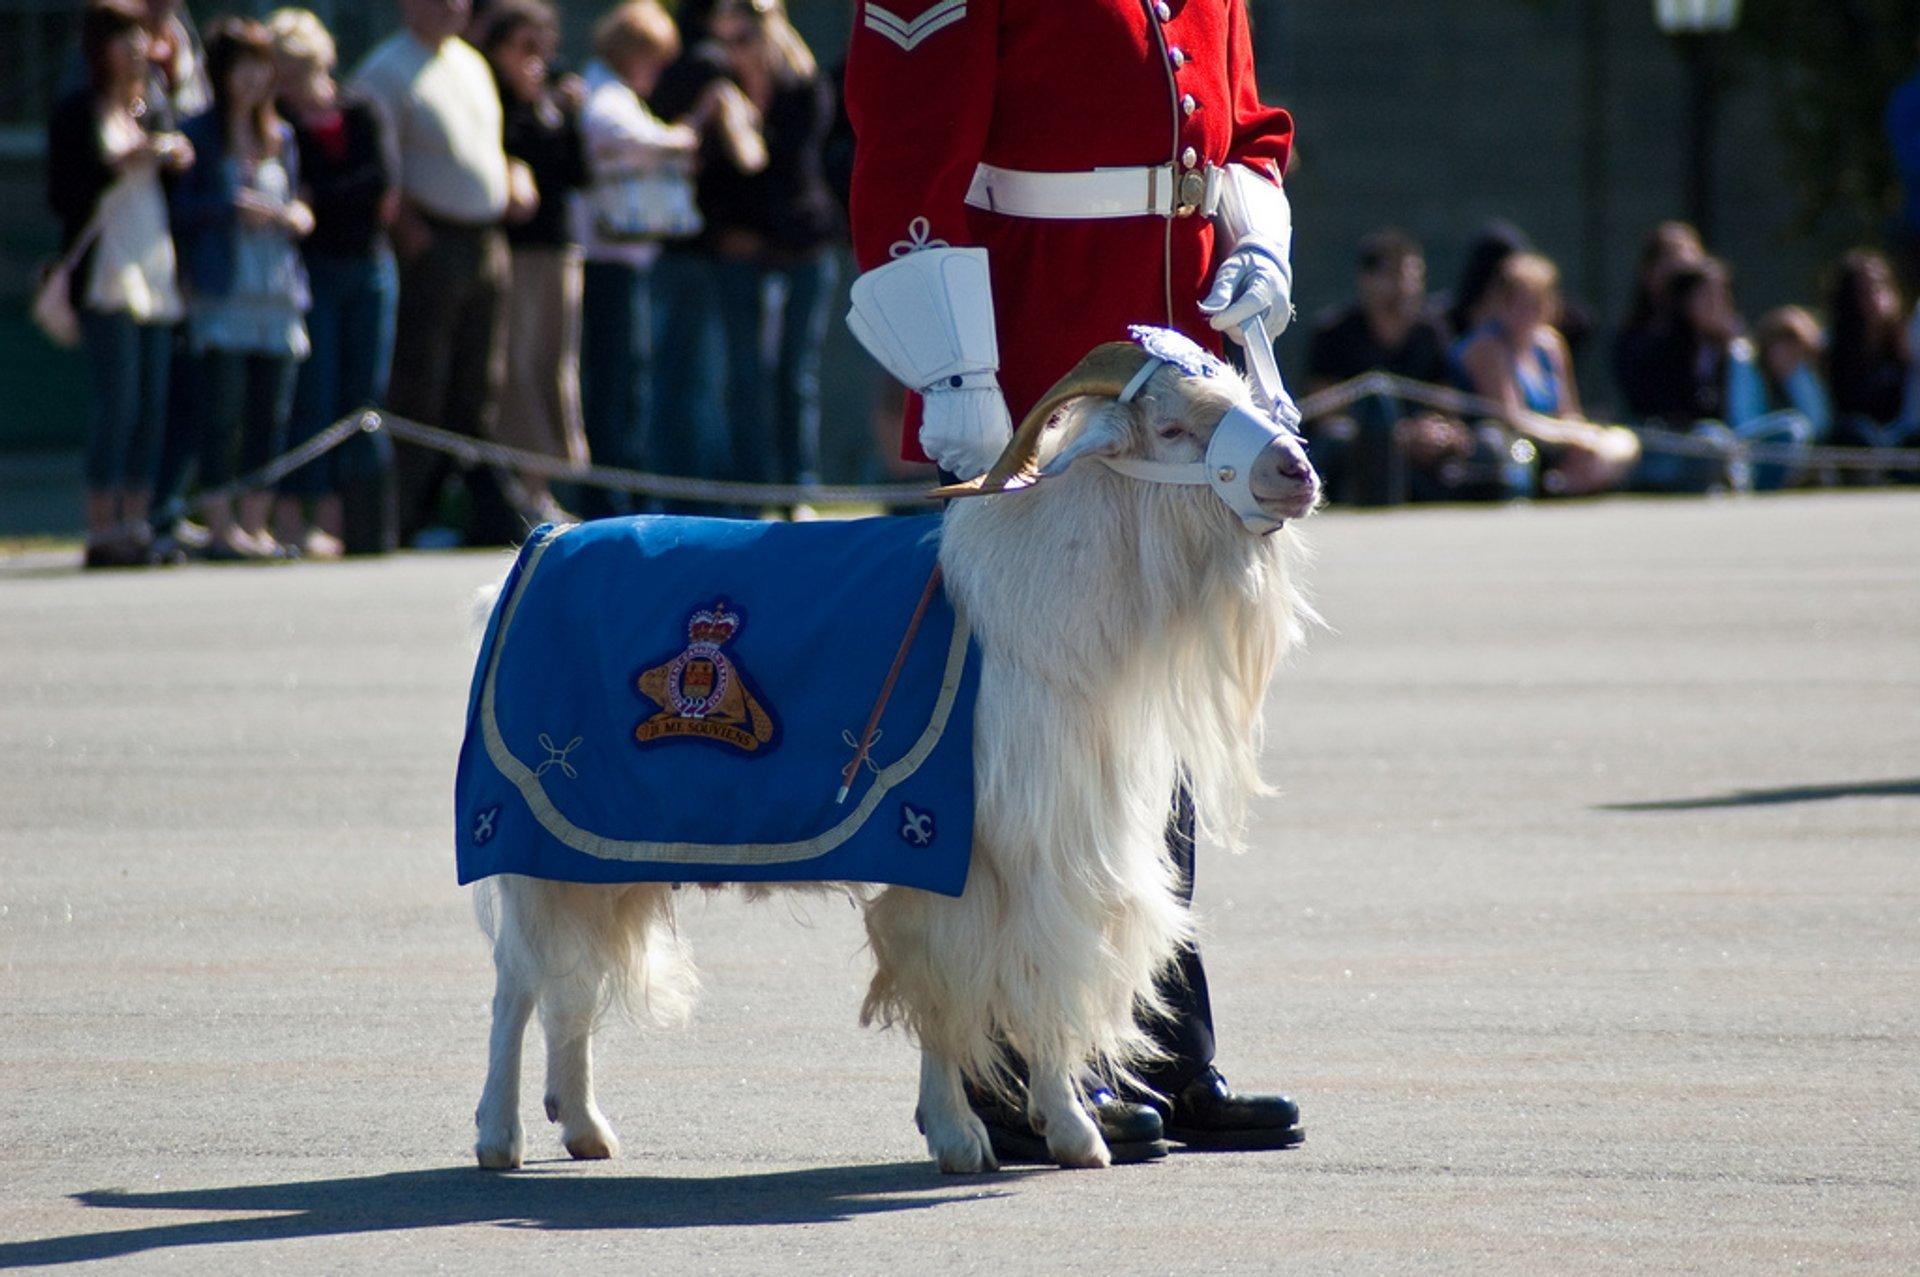 Regimental mascot Batisse the Goat 2020